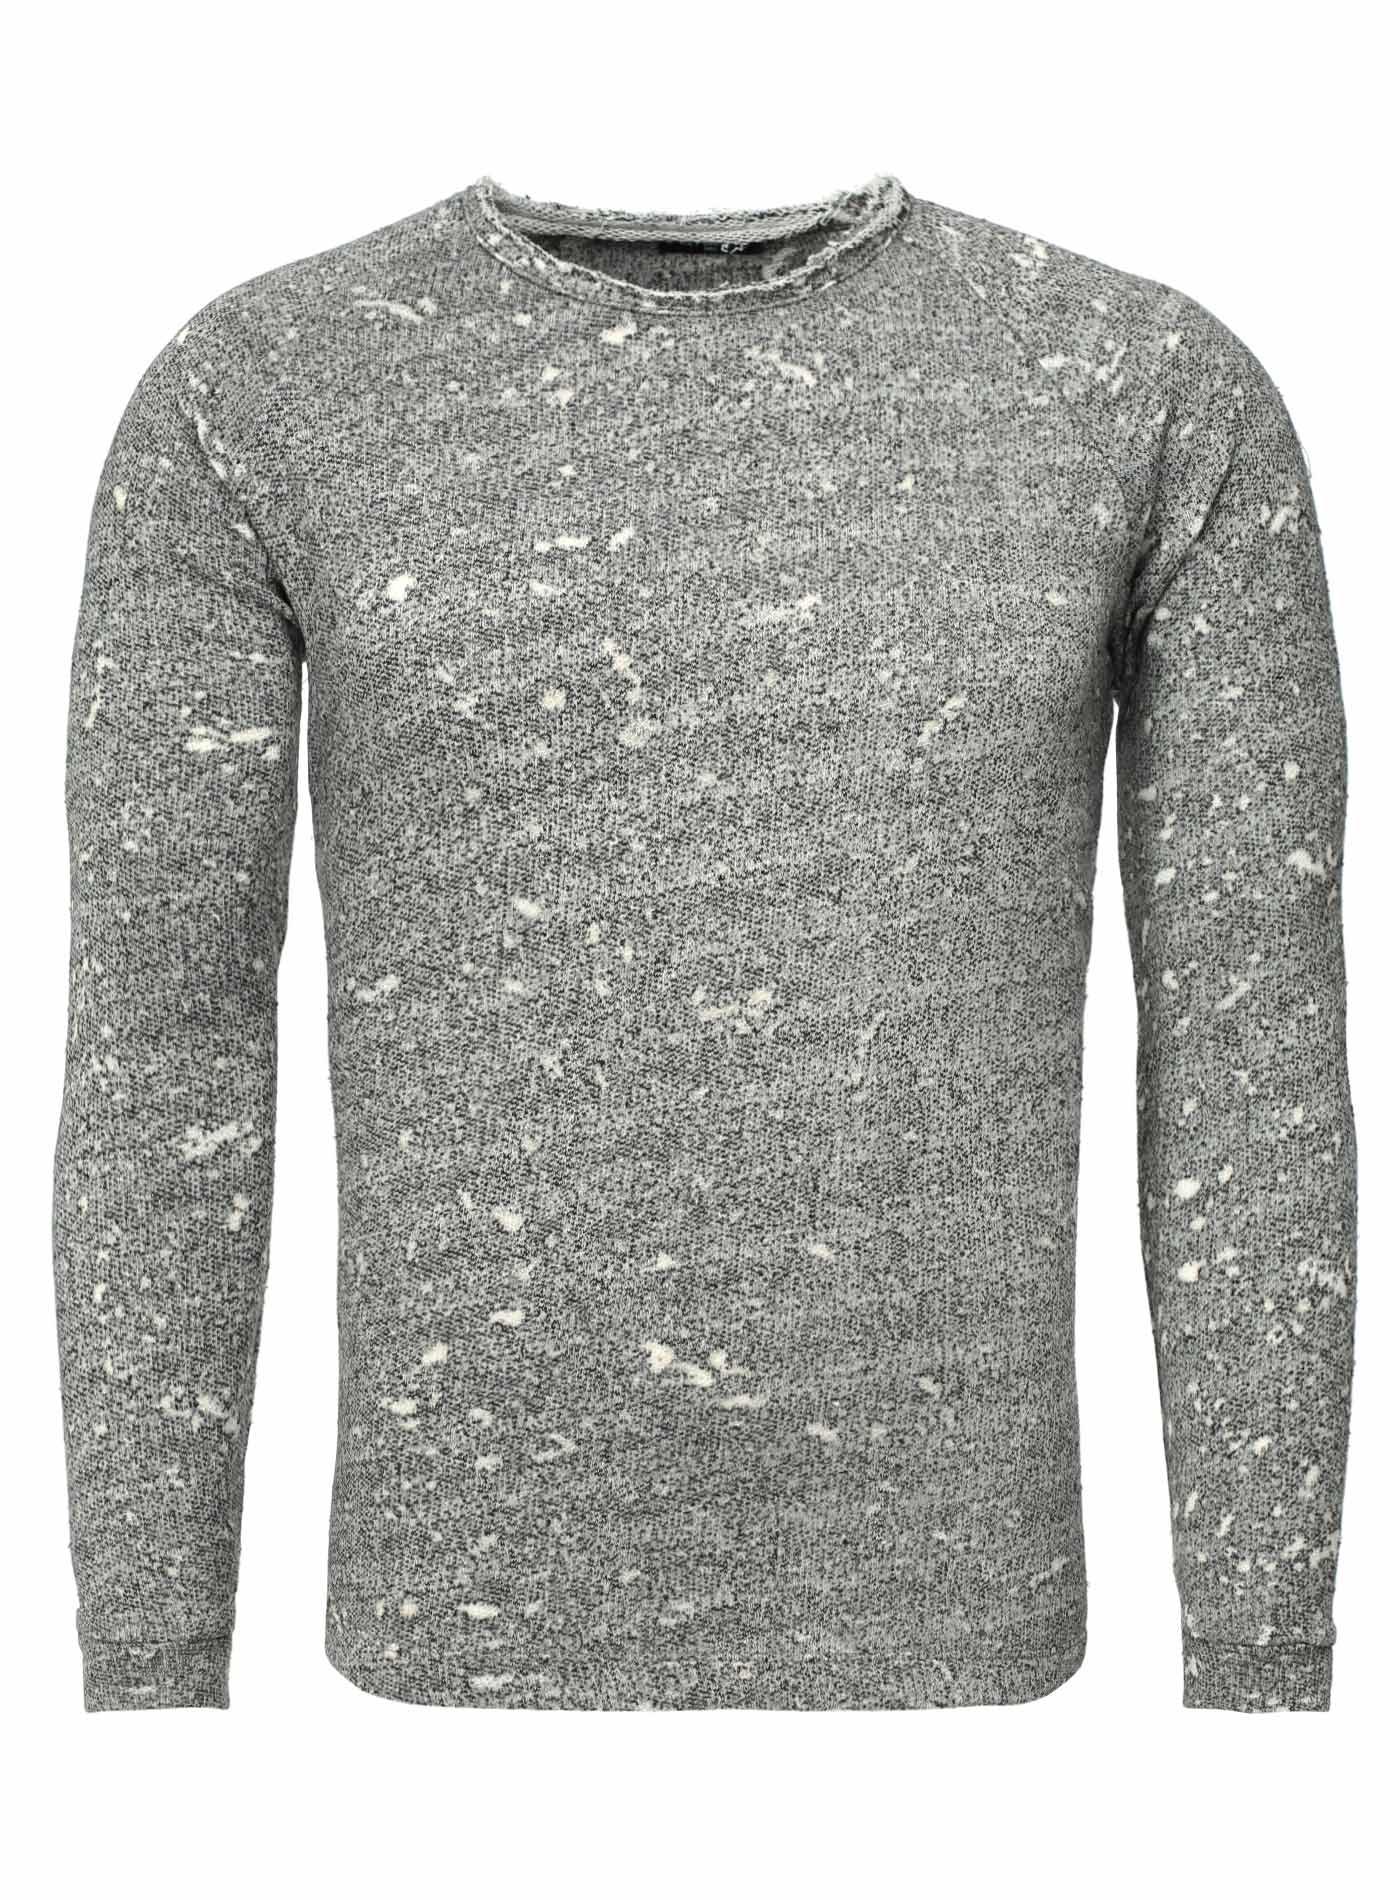 sweatshirts sweatjacken herren key largo deutschland. Black Bedroom Furniture Sets. Home Design Ideas